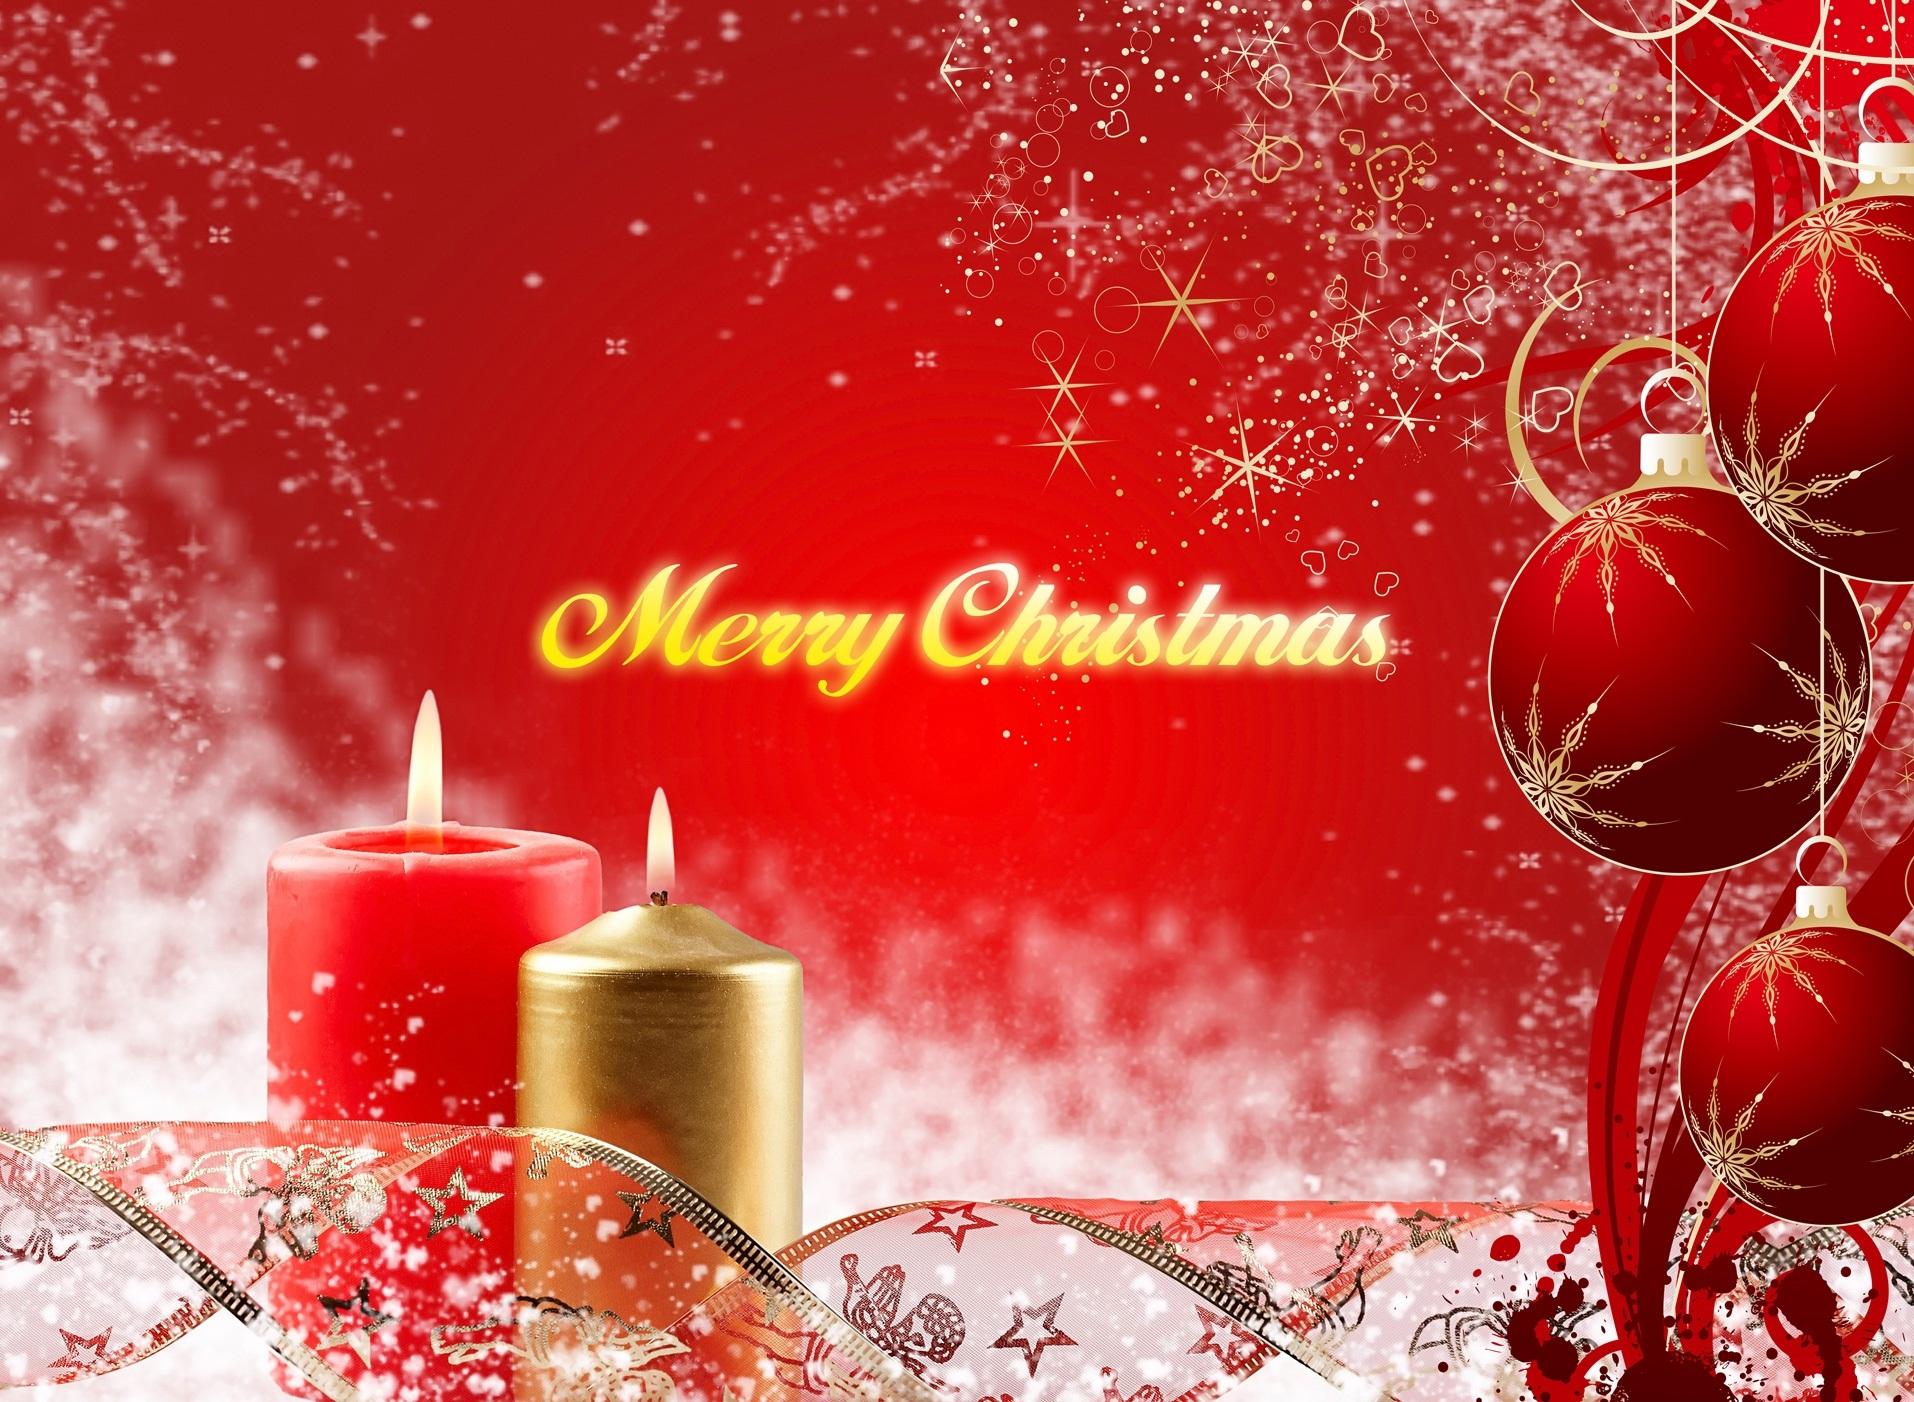 Seivo   Image   christmas screensavers   Seivo Web Search Engine 1914x1402